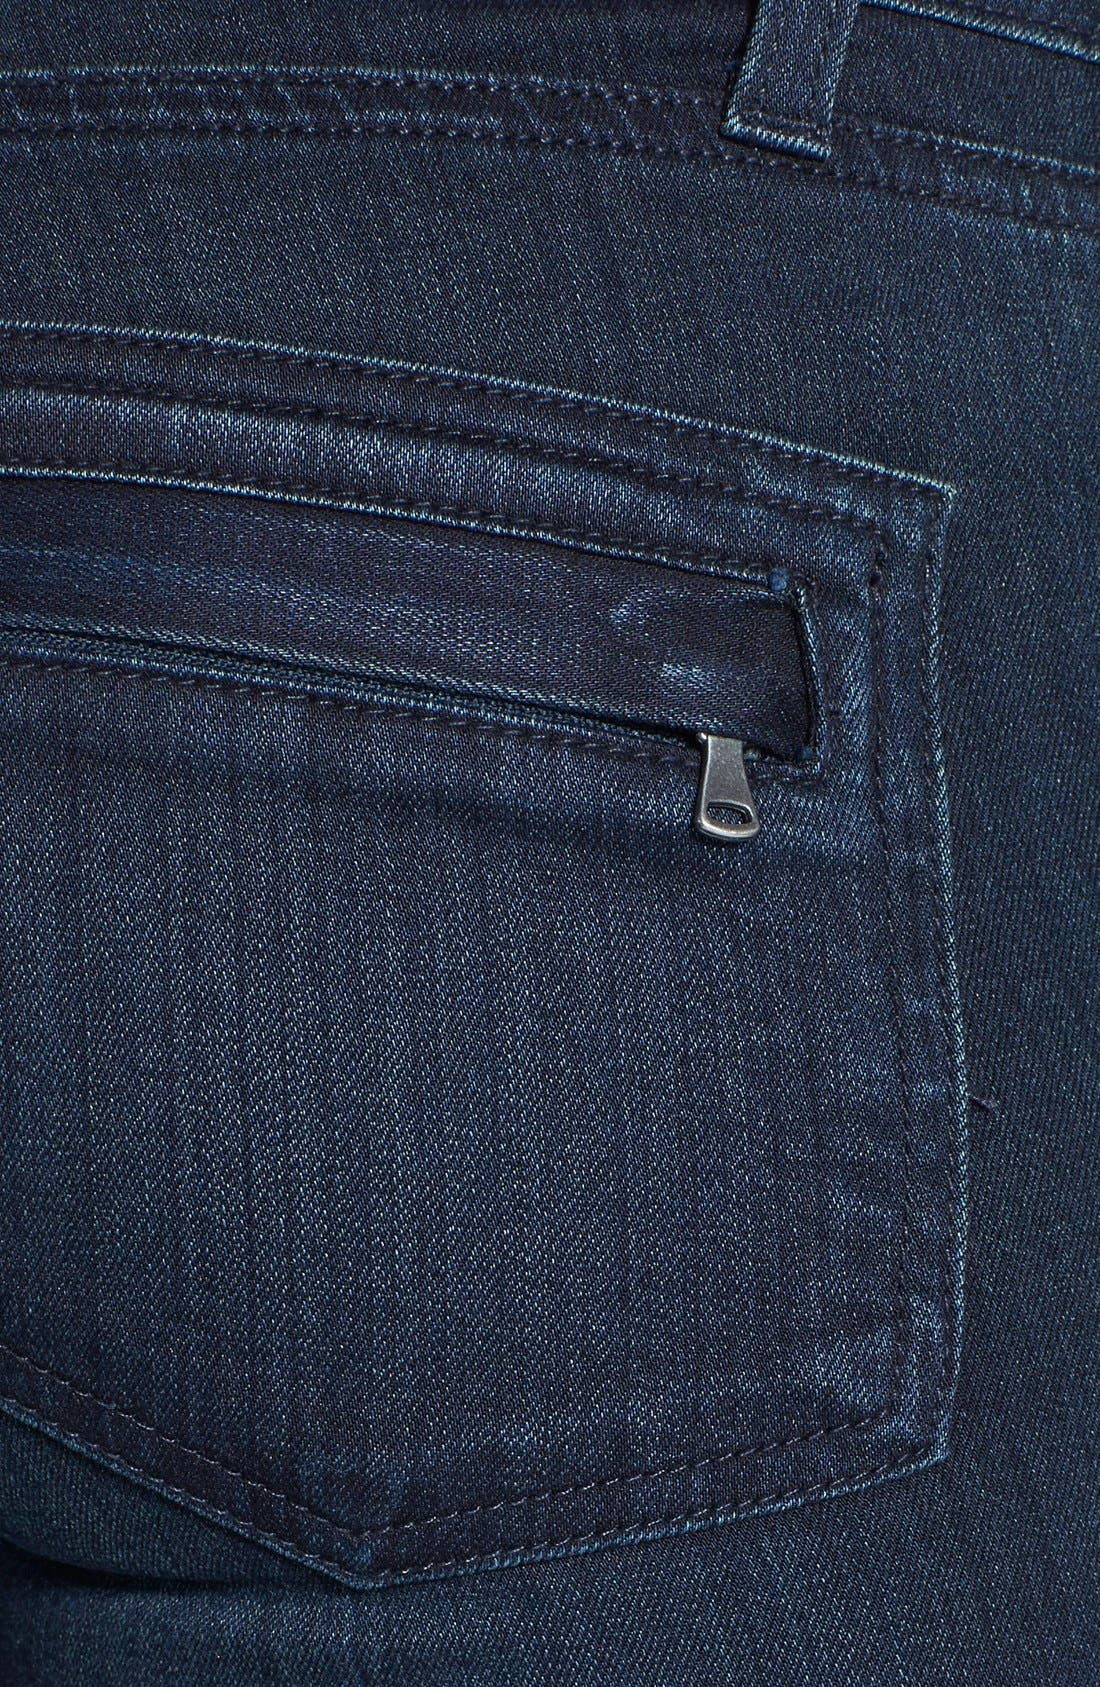 Alternate Image 3  - Paige Denim 'Ollie' Ultra Skinny Jeans (Midlake No Whiskers)